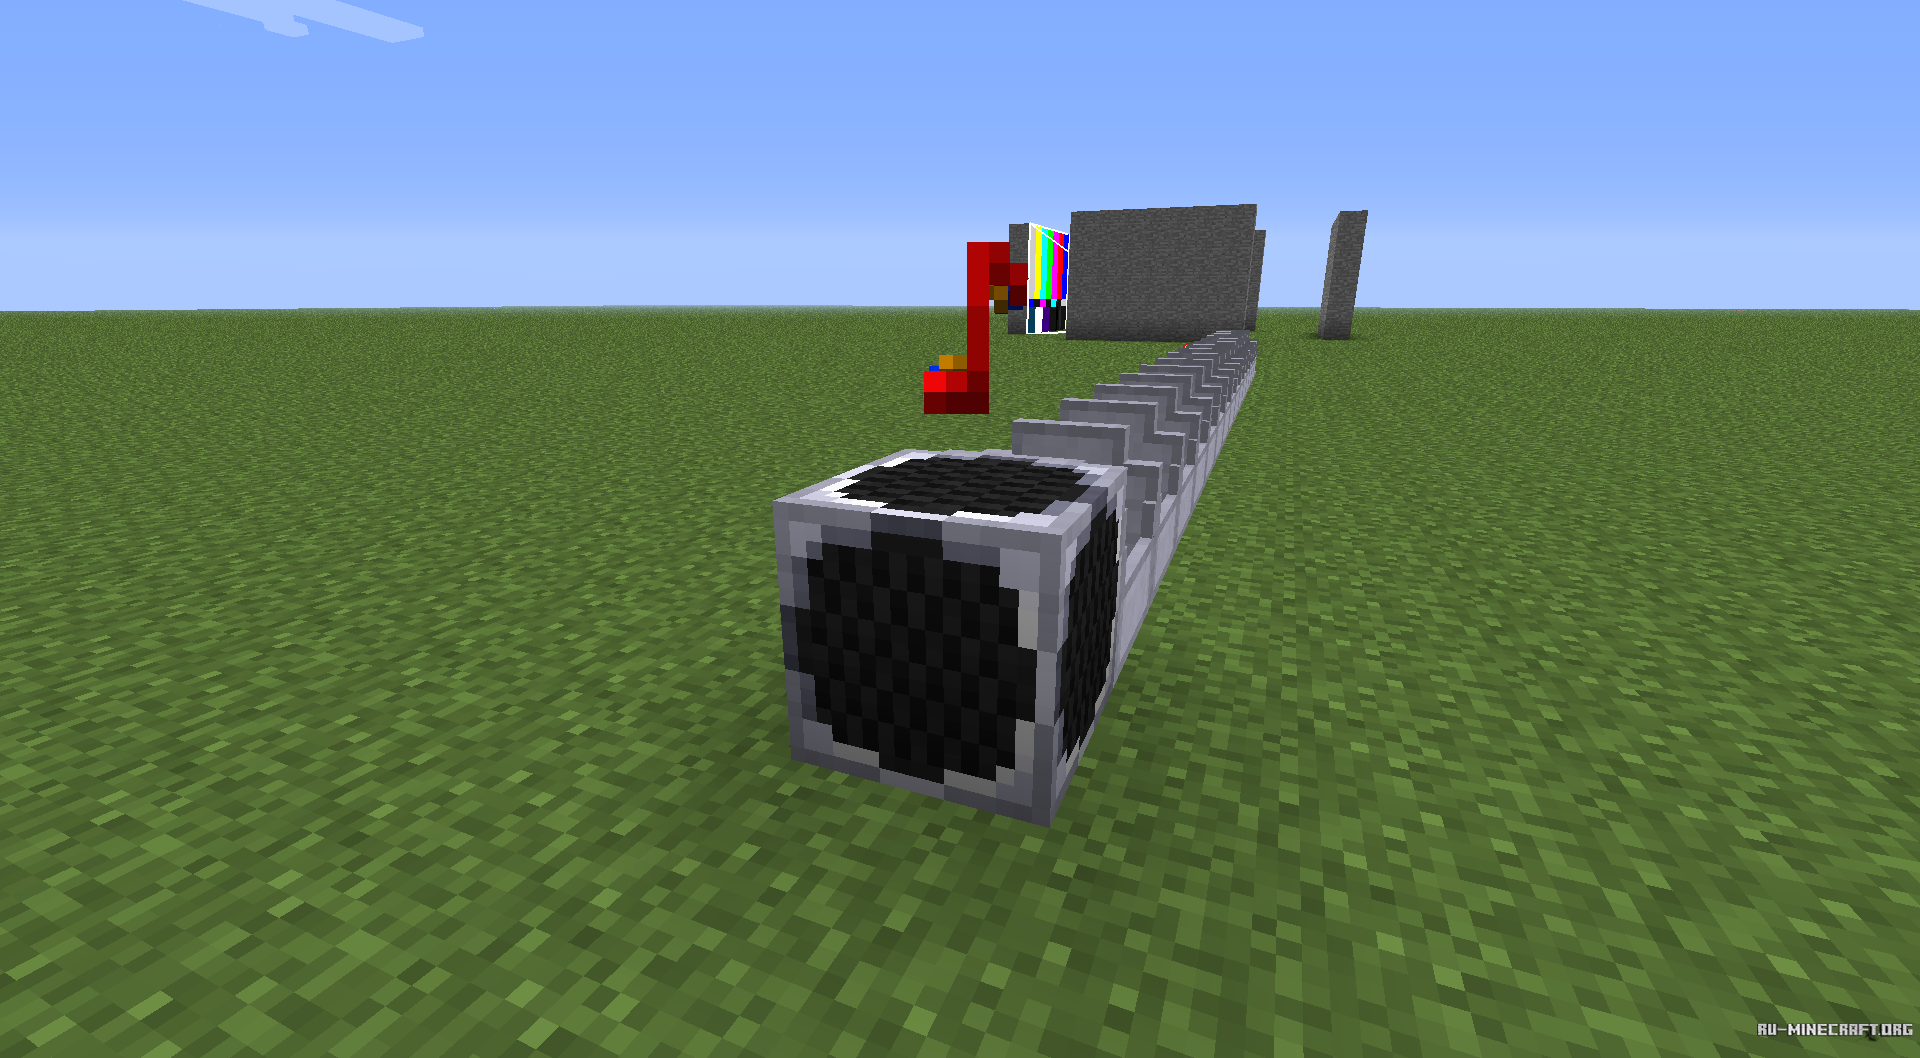 скачать моды на майнкрафт 1.7.10 rotarycraft